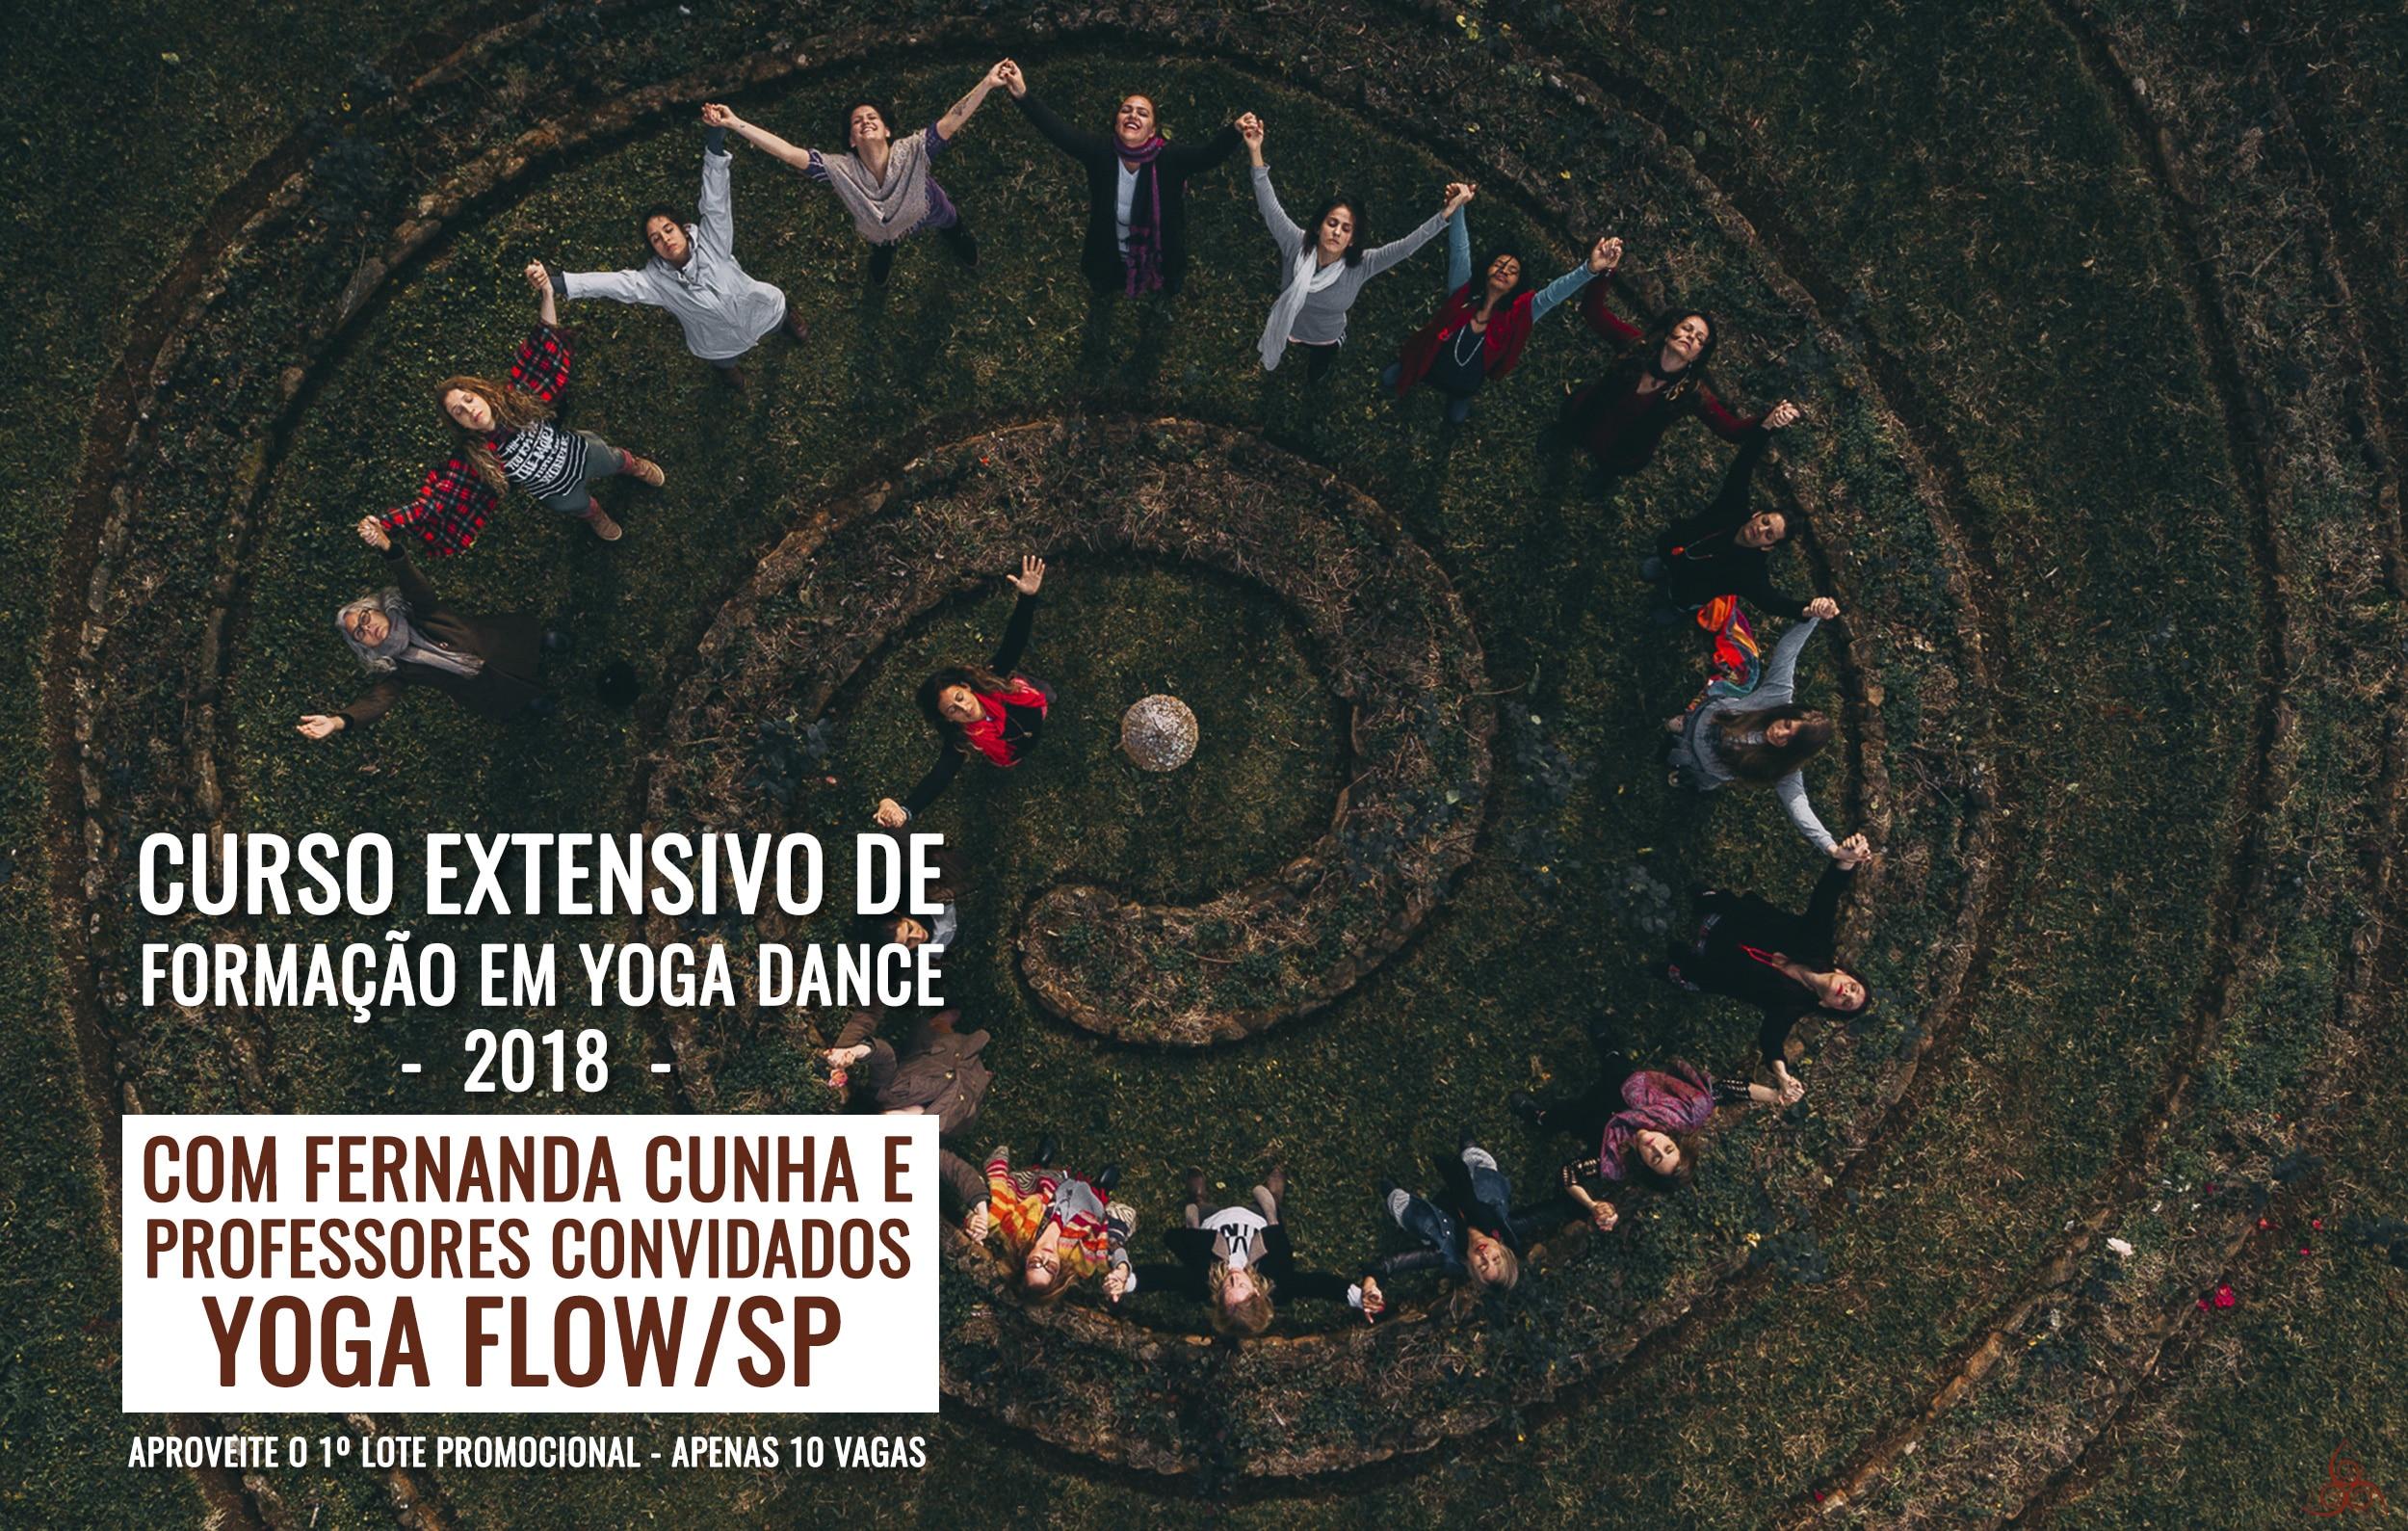 yoga_dance_sp_fernanda_cunha